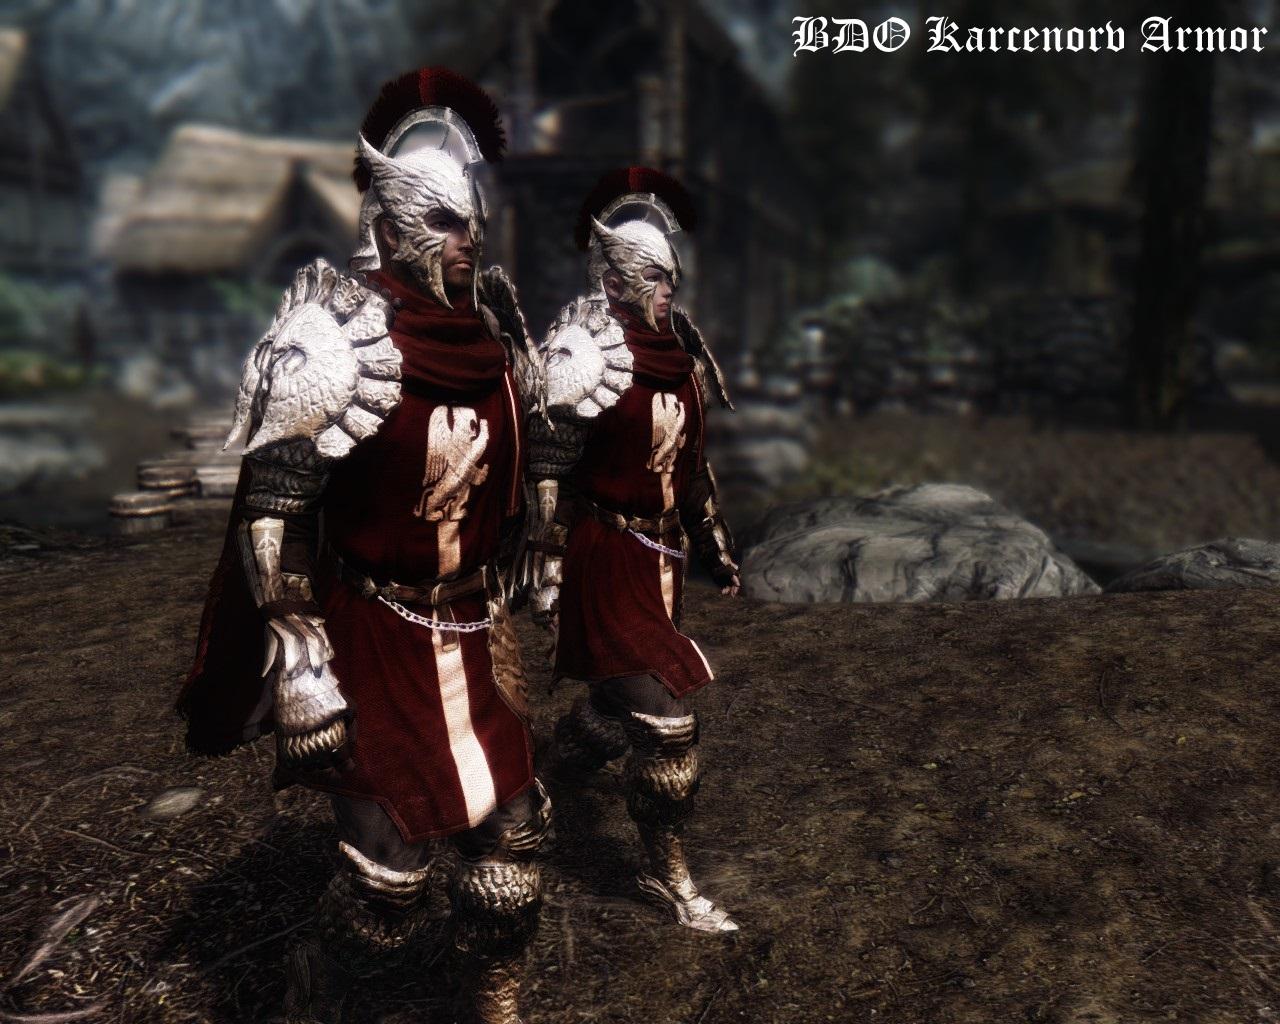 BDO Karcenorv Armor 01.jpg